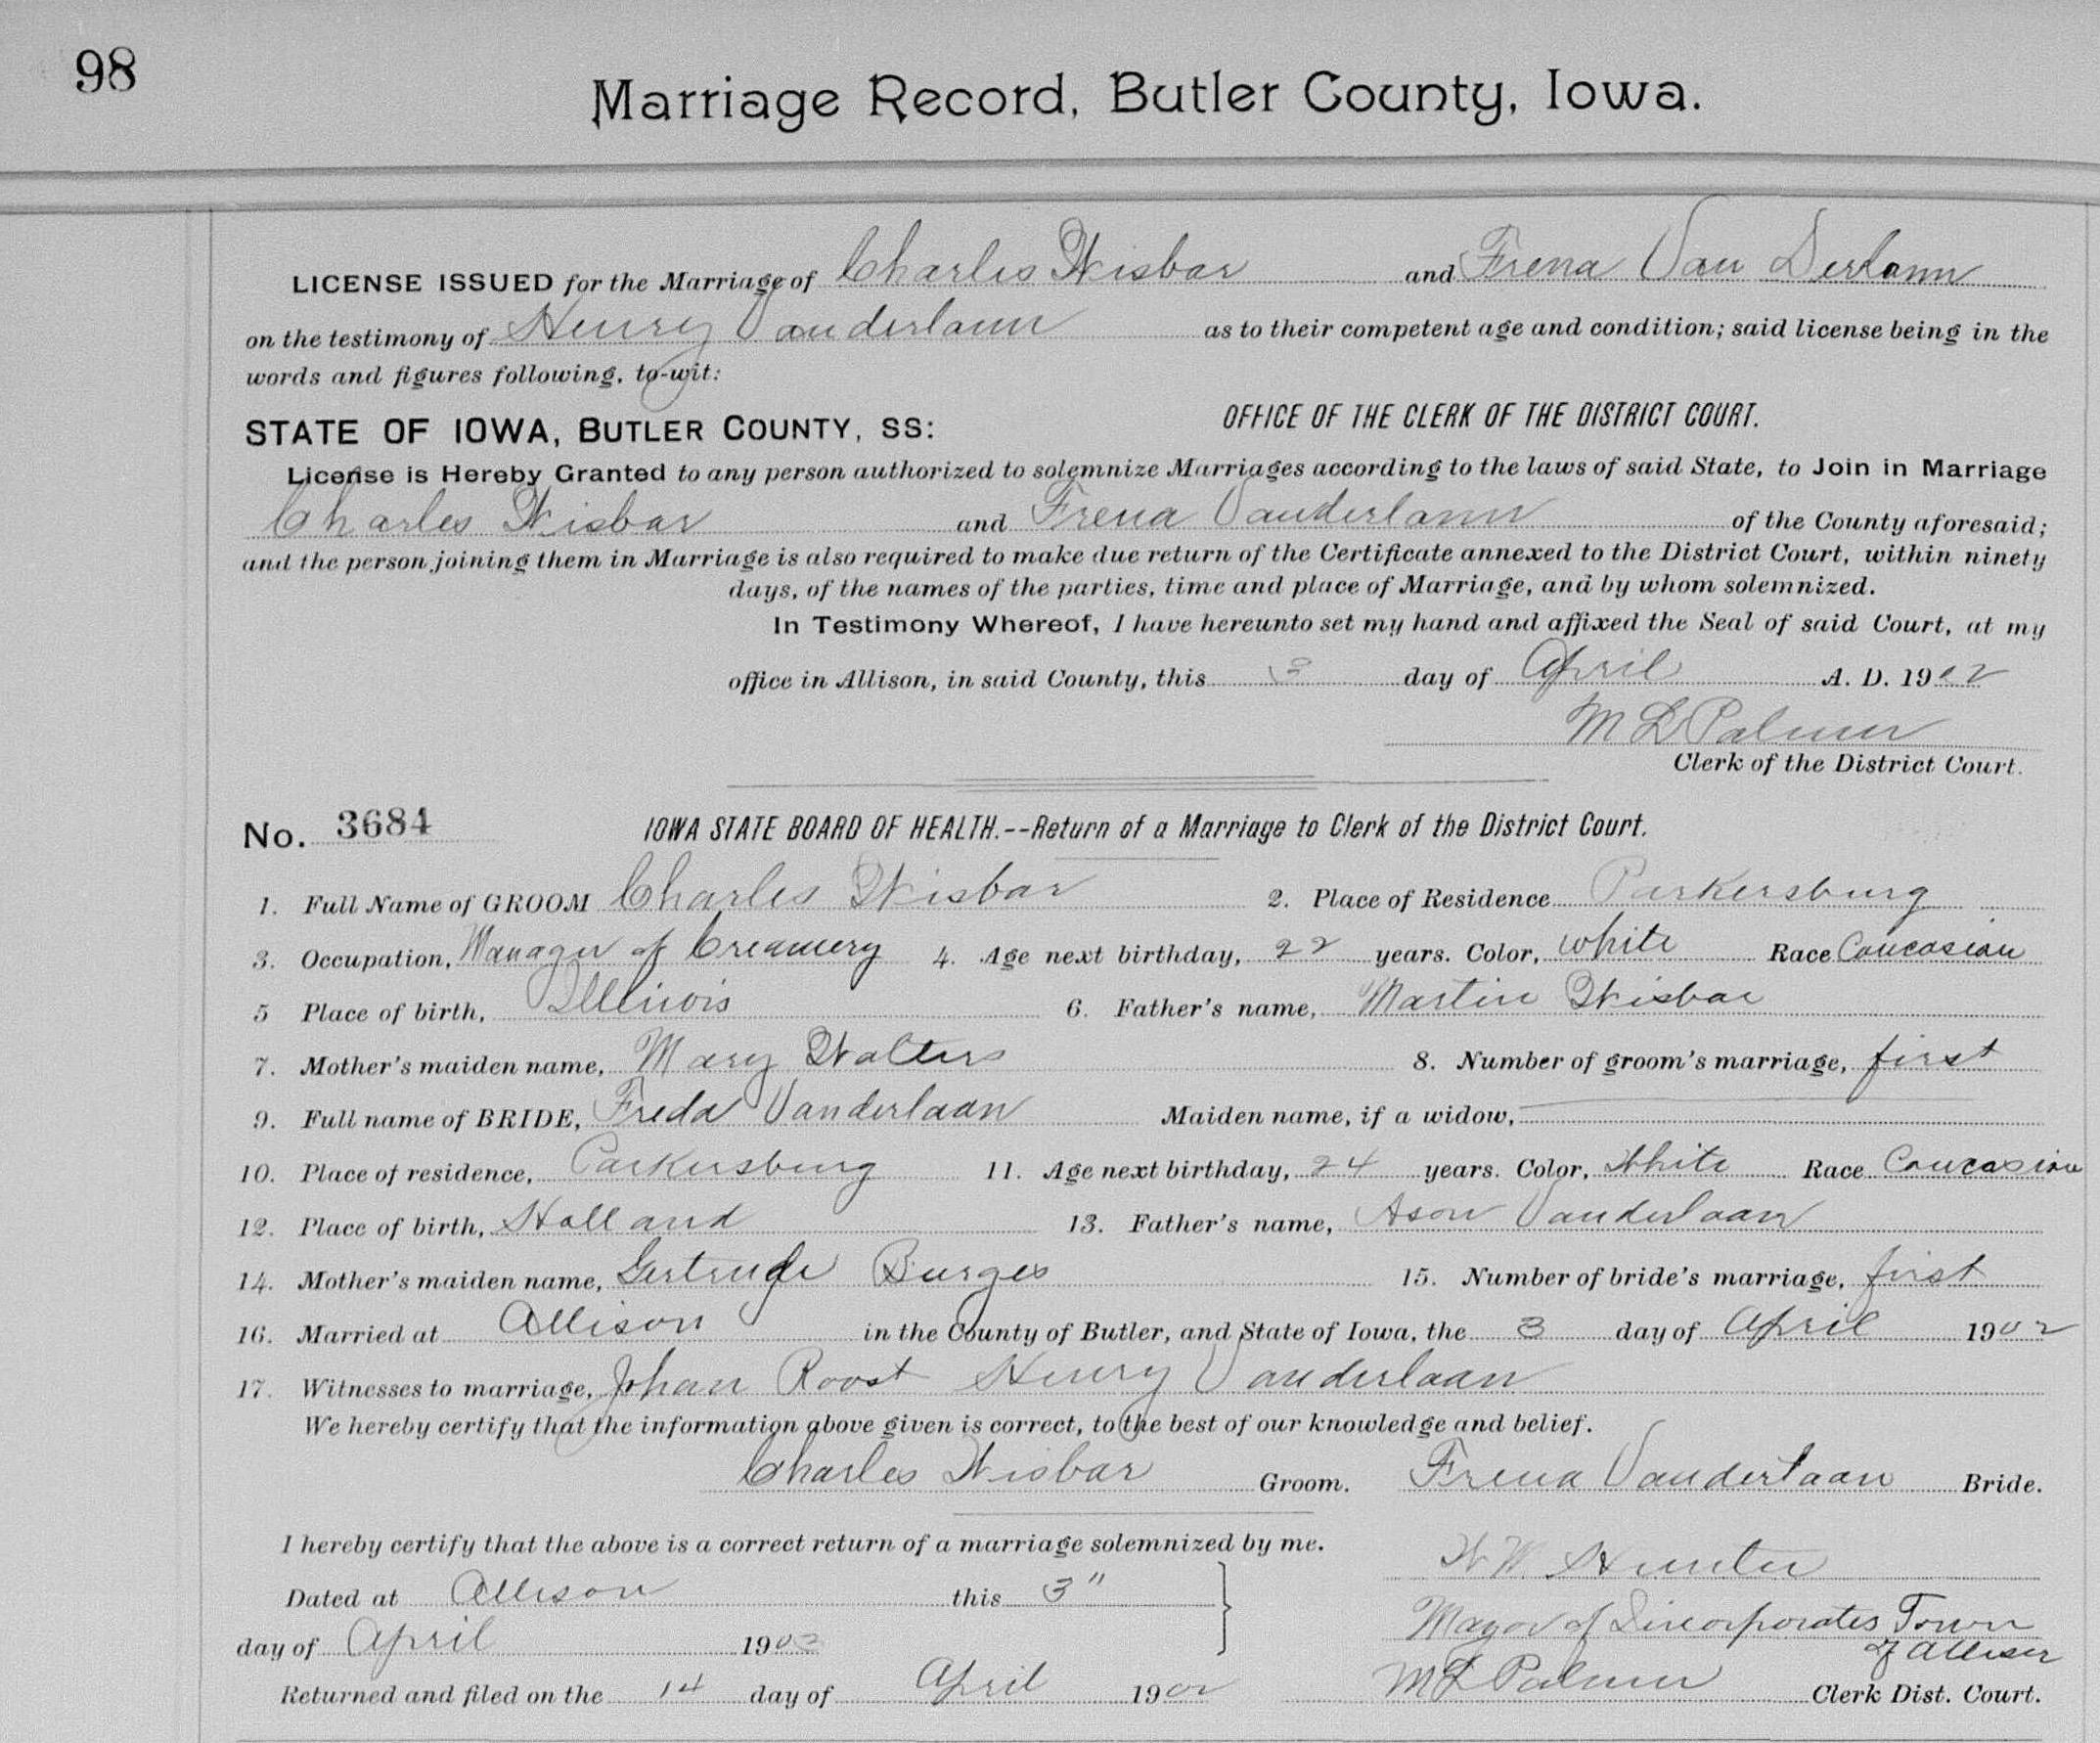 Wisbar, Charles and Trena Vanderlaan 1902 marriage 2